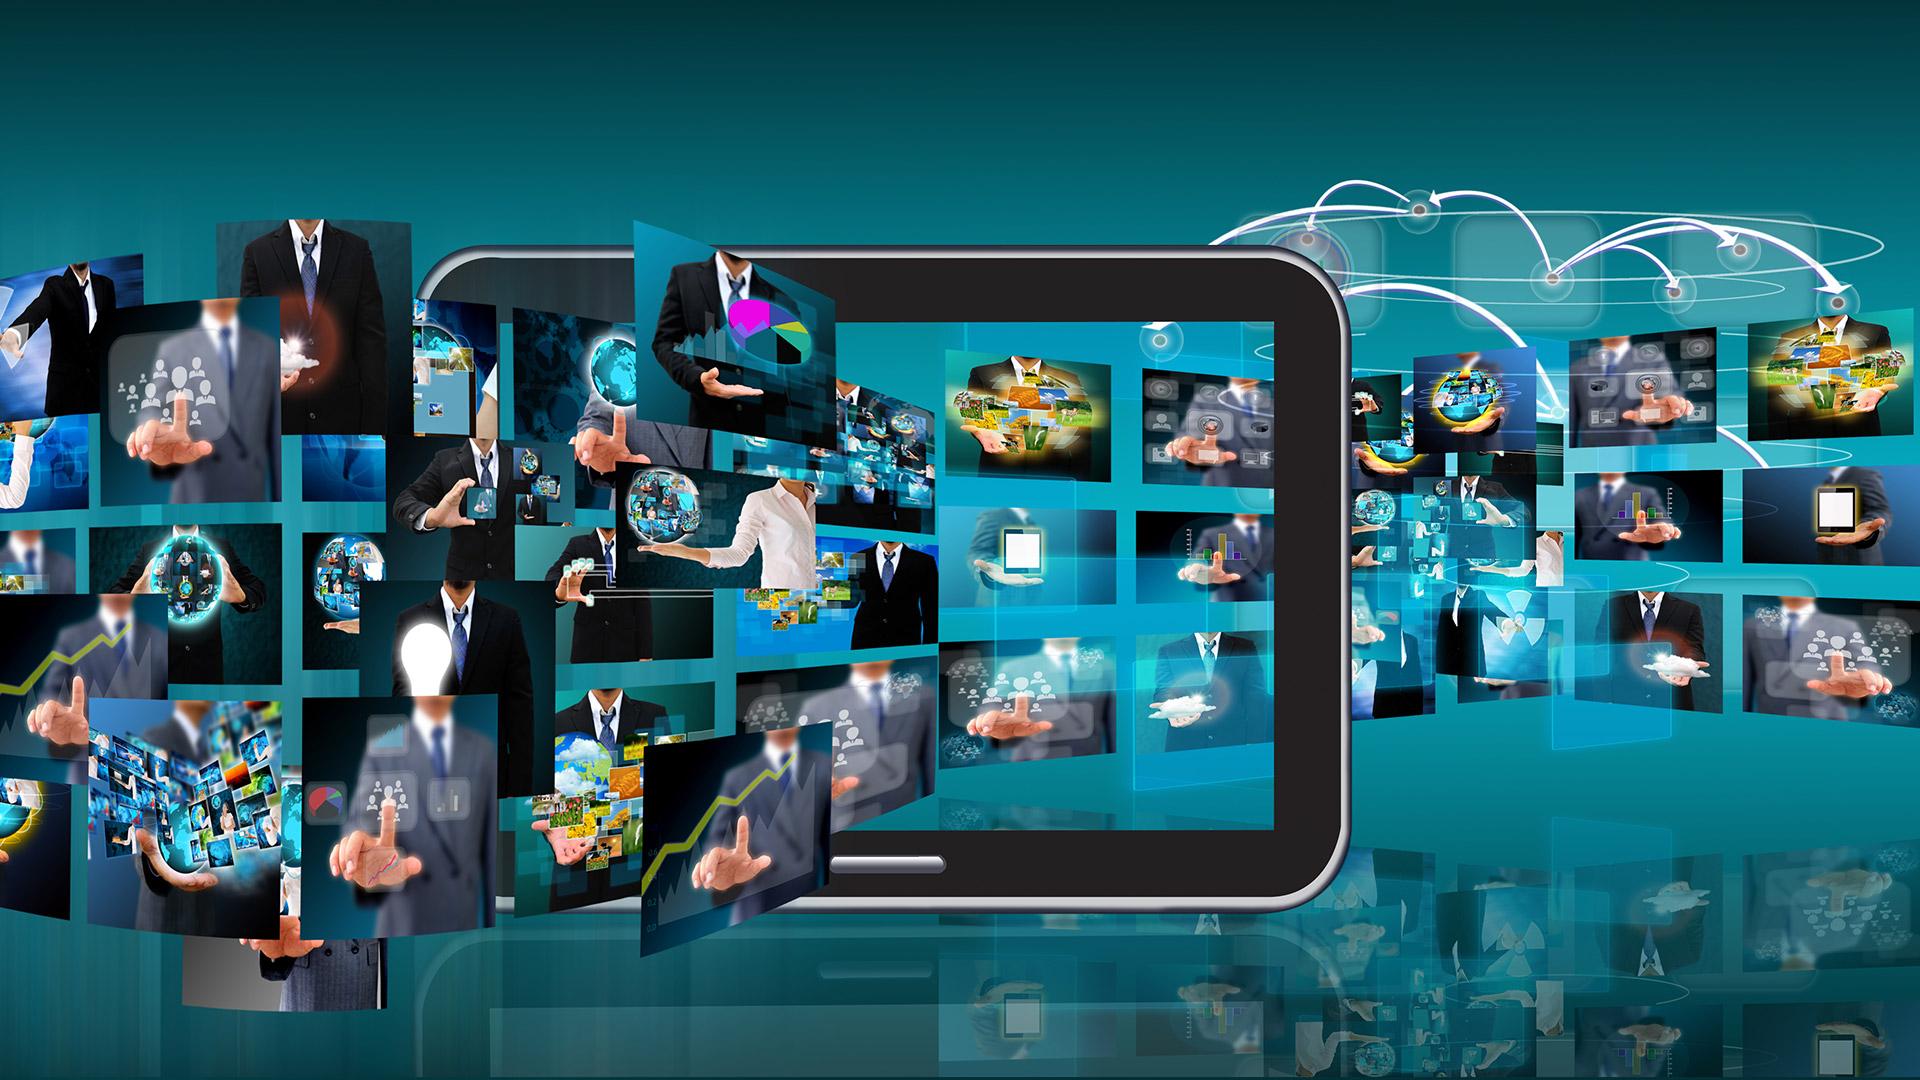 Naver视频下载器, 免费在线下载 Youtube、 Facebook、 Vimeo、 优酷、 雅虎...支持200+的在线下载站